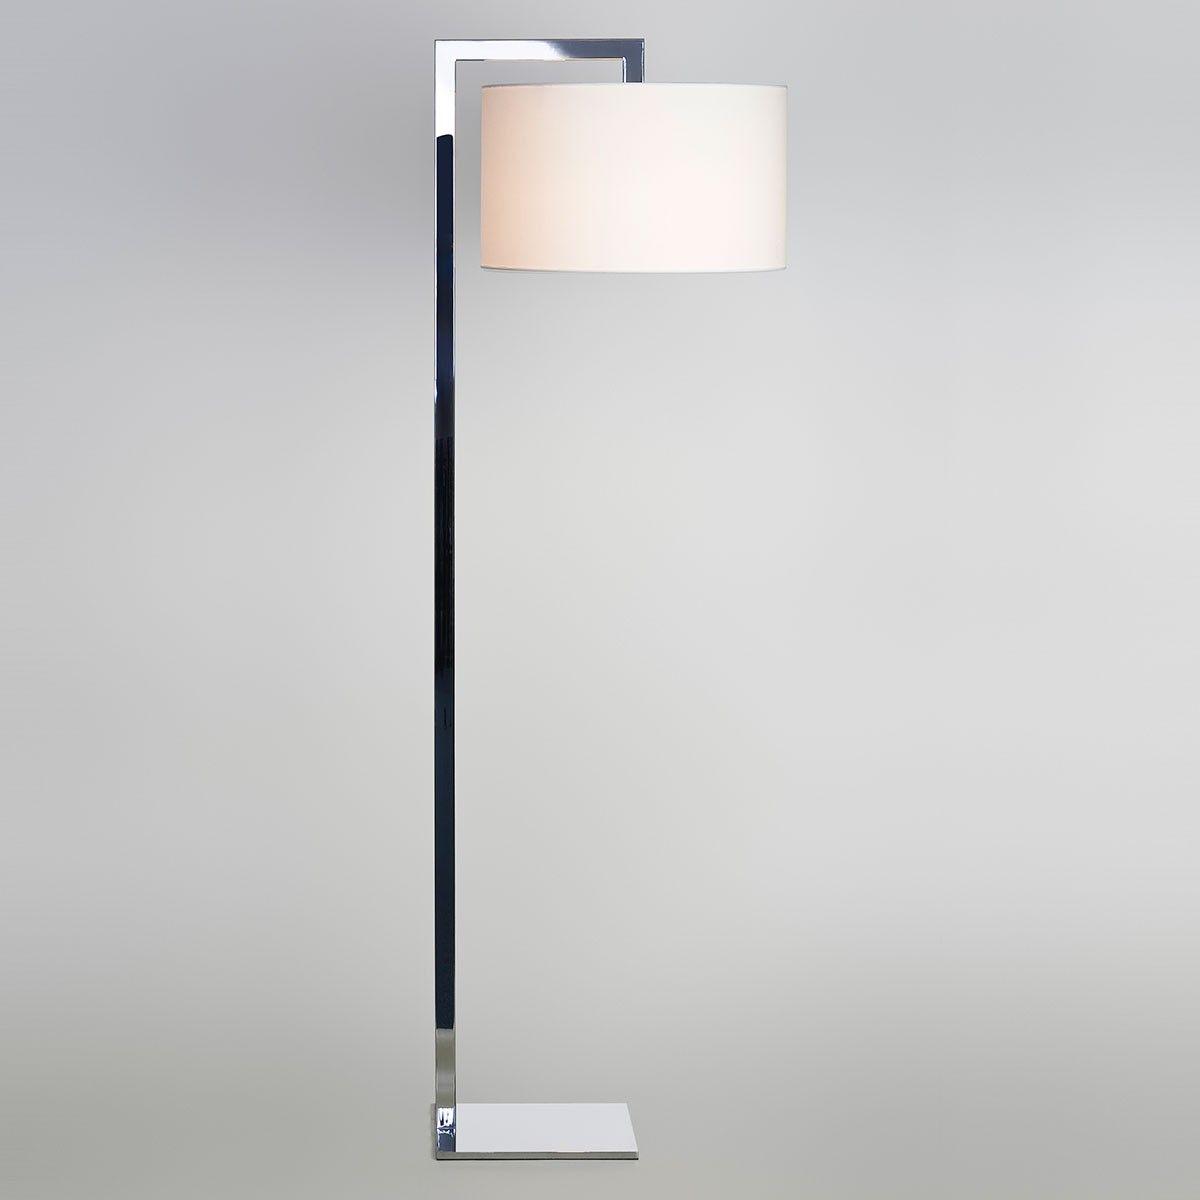 Astro ravello floor polished chrome floor lamp with white large drum astro ravello floor polished chrome floor lamp with white large drum shade aloadofball Choice Image